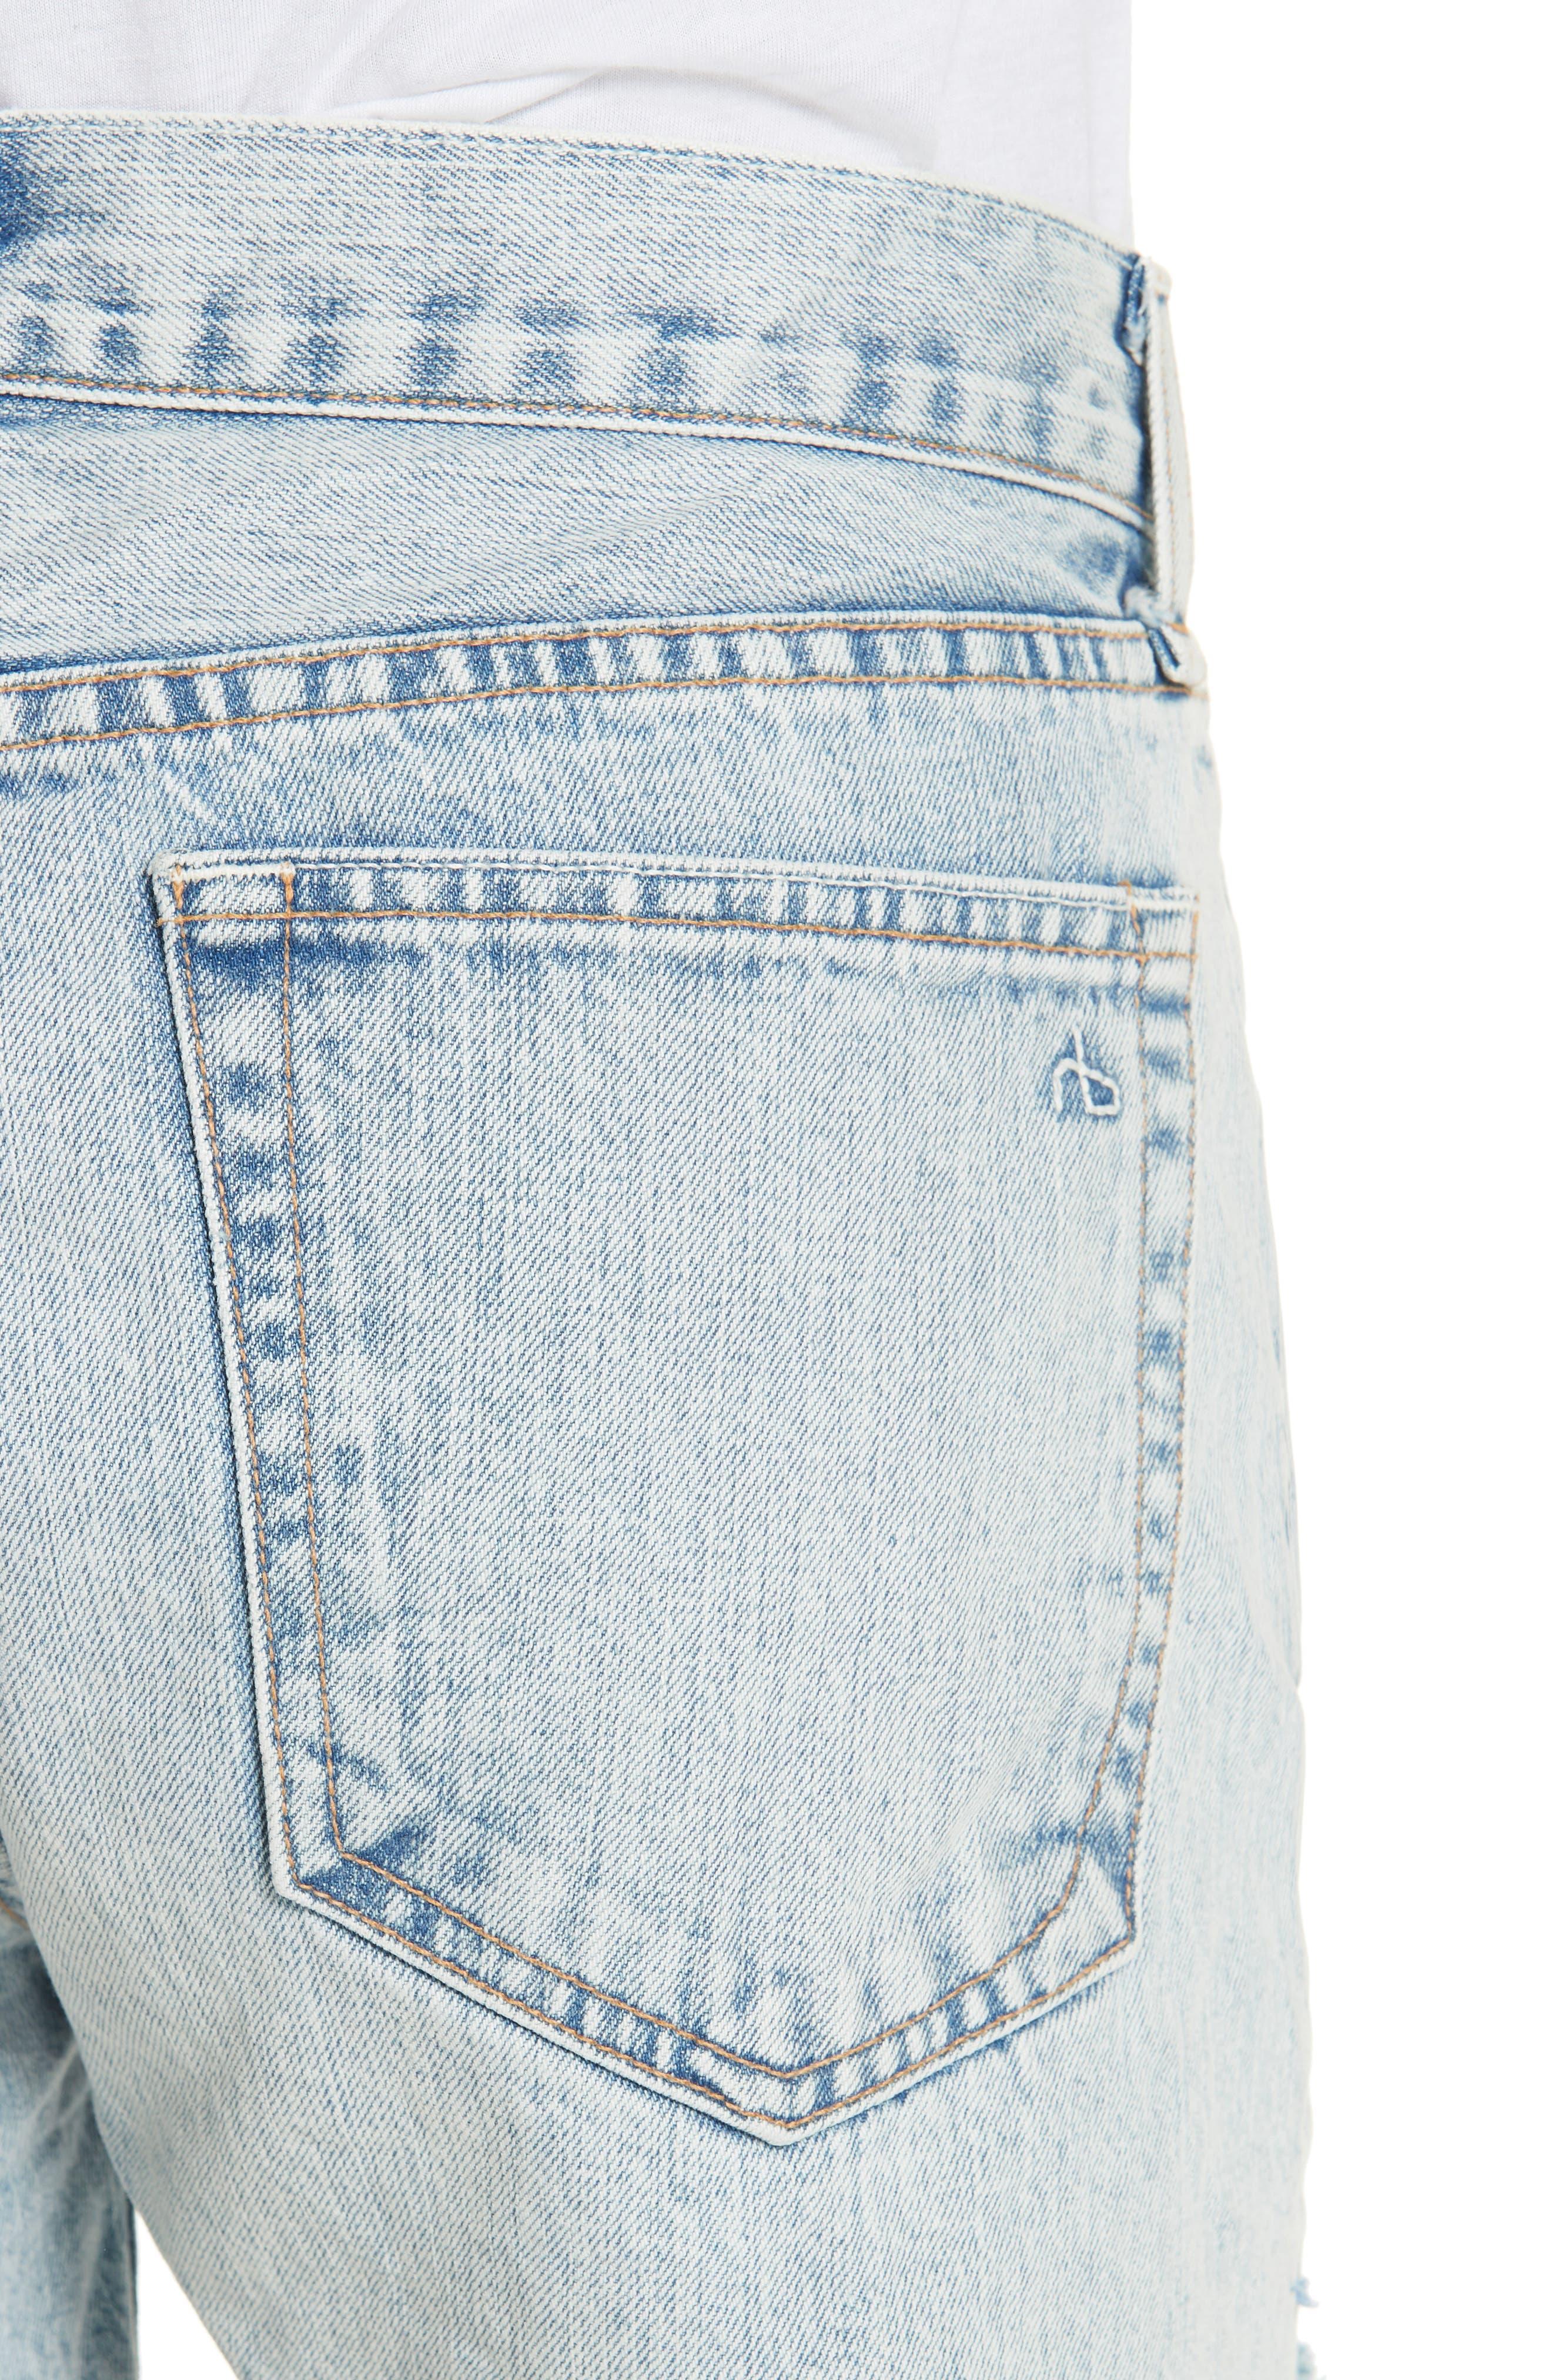 RAG & BONE, JEAN Cutoff Boyfriend Shorts, Alternate thumbnail 5, color, 420